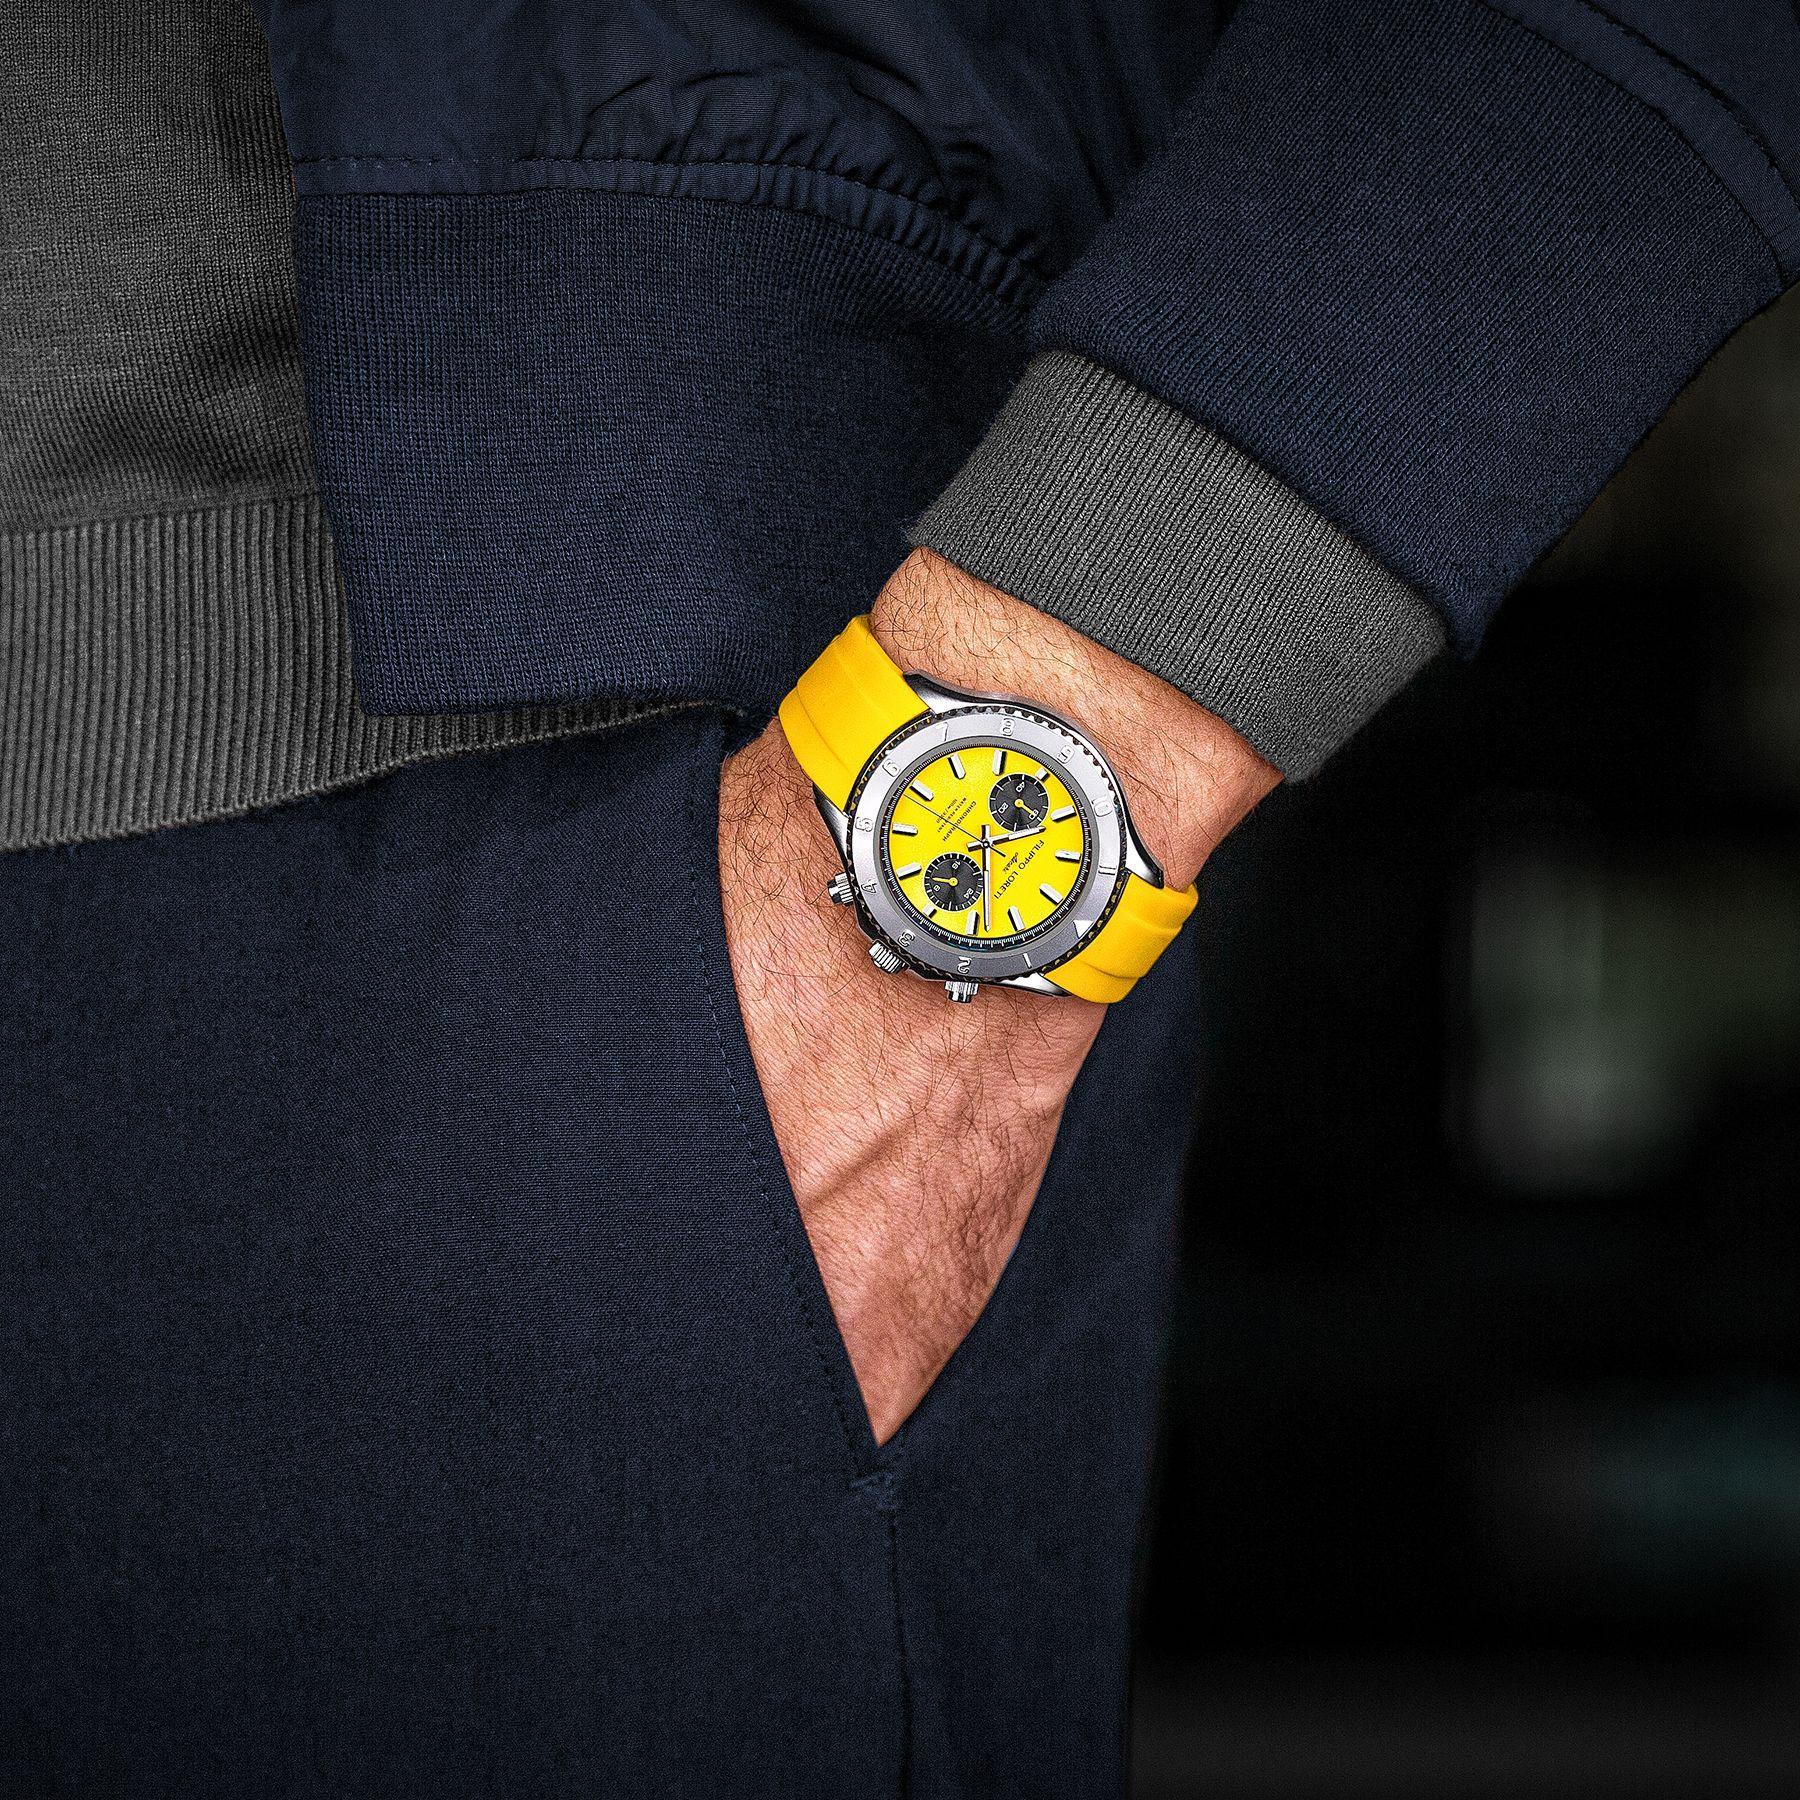 Ascari Tuscany Rubber Men's Watch from Filippo Loreti